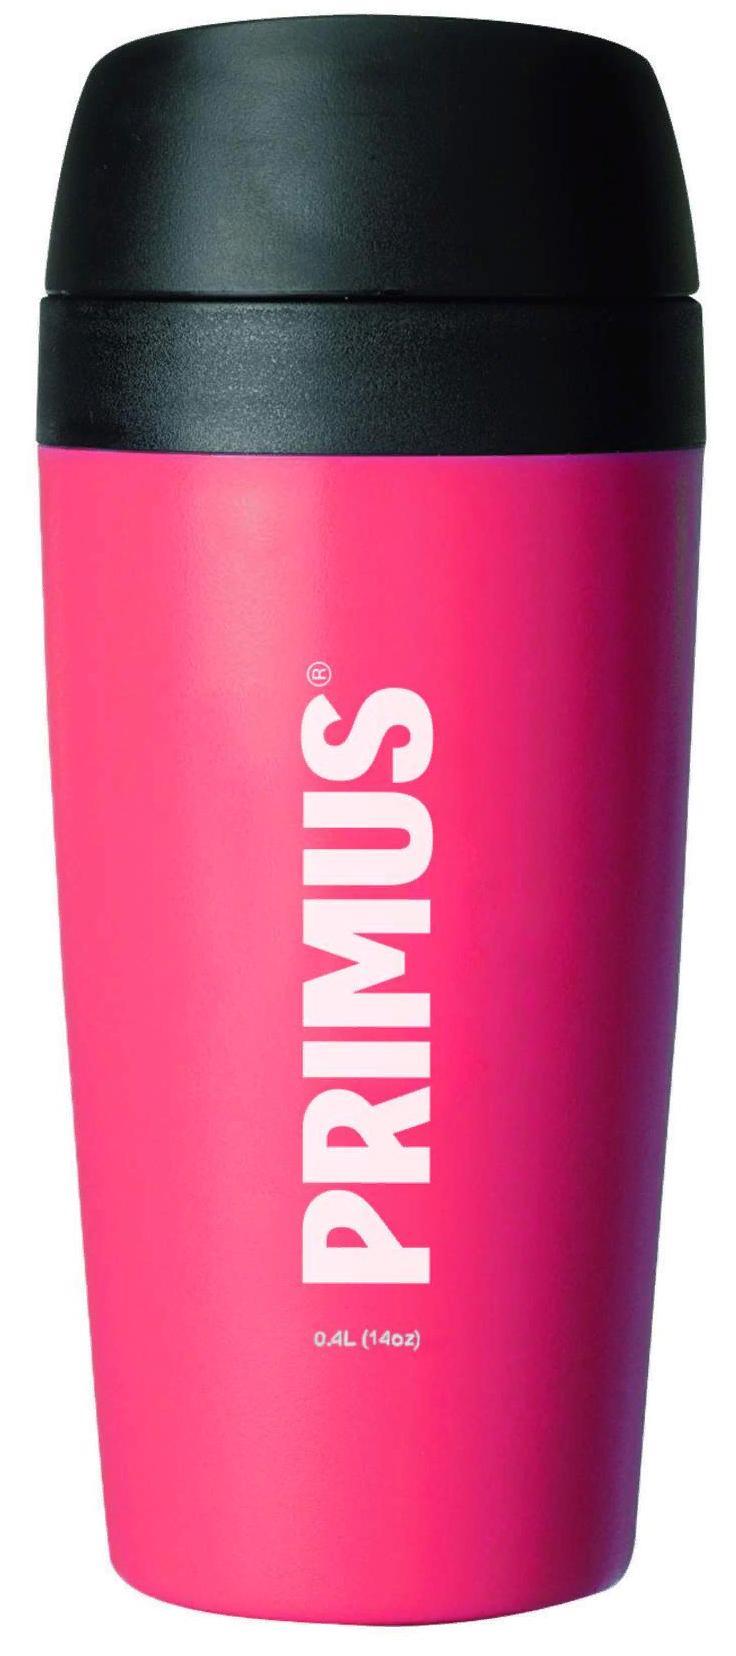 Термокружка Primus Commuter mug 0.4 Melon Pink, Посуда - арт. 1044130196